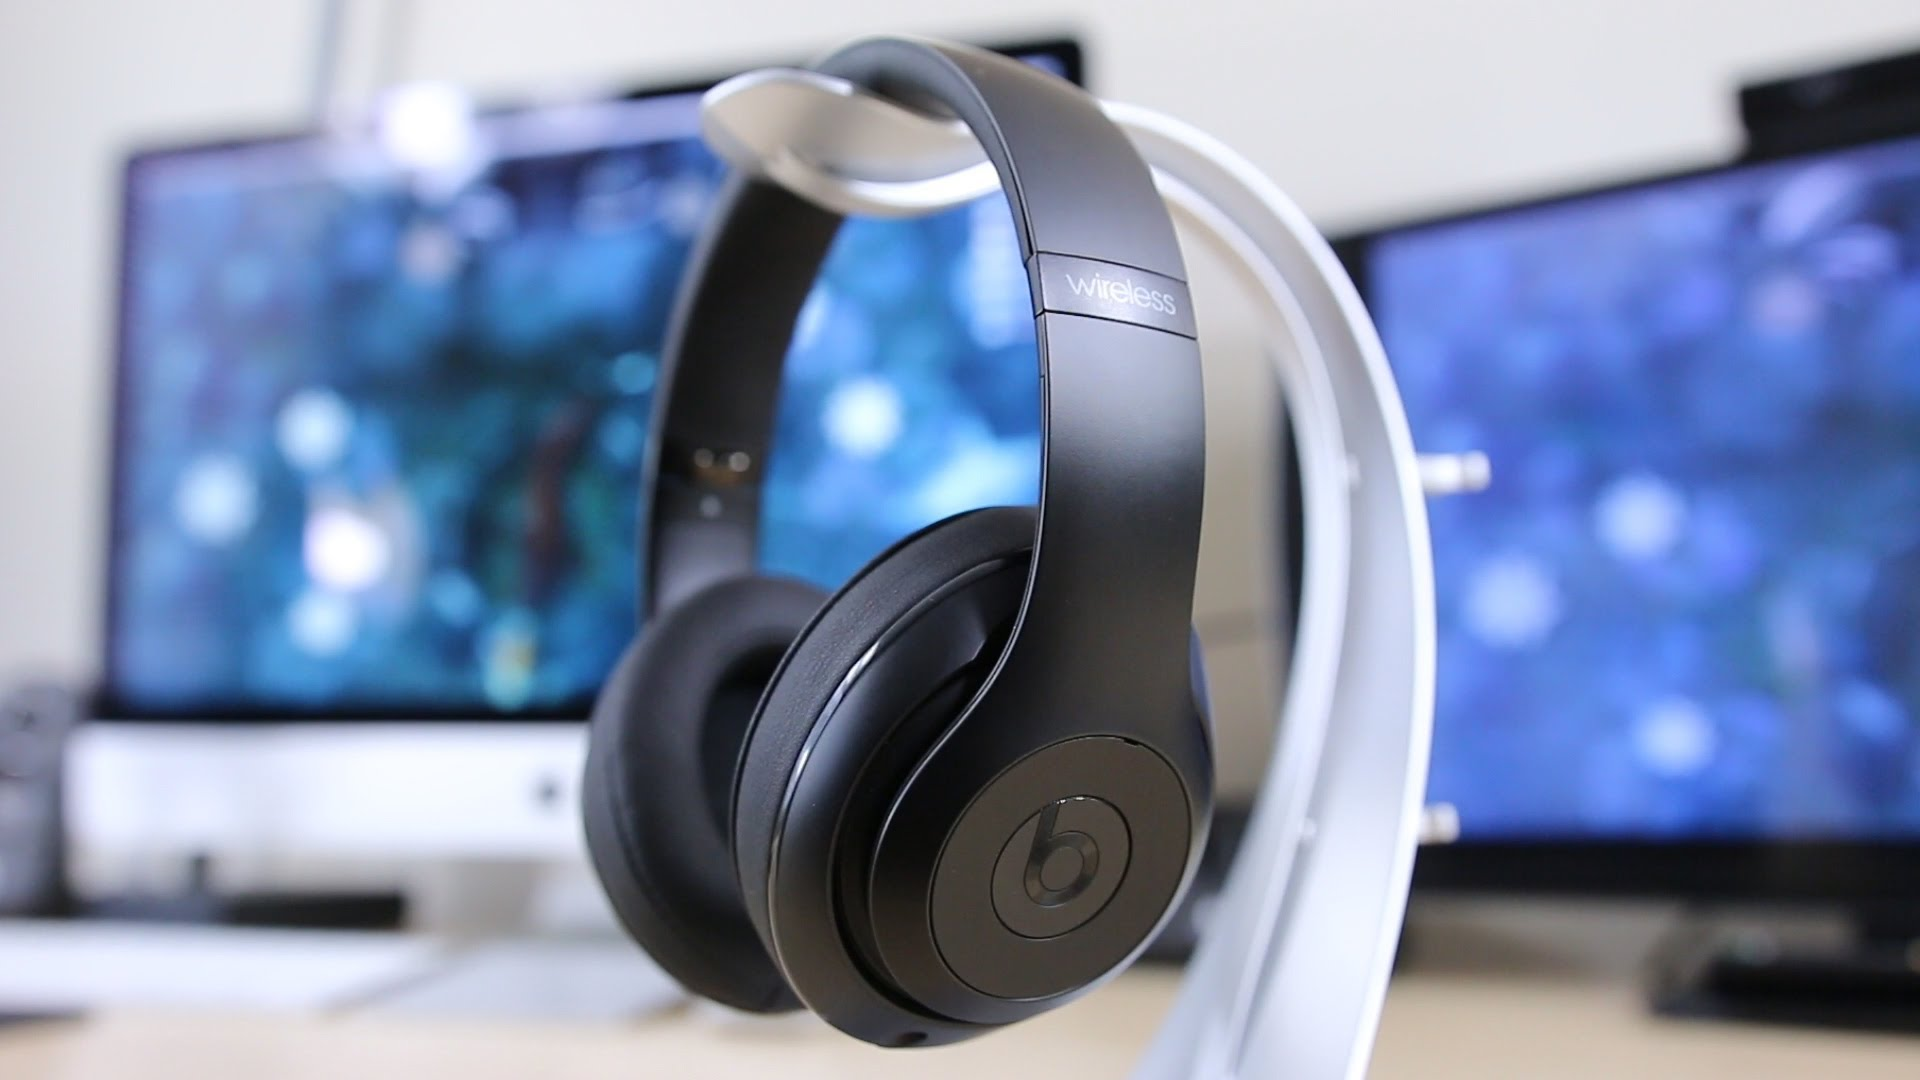 Beats Studio Wireless の本気の使い方。高級ヘッドホンを買ったら生活レベルがグンと上がった話